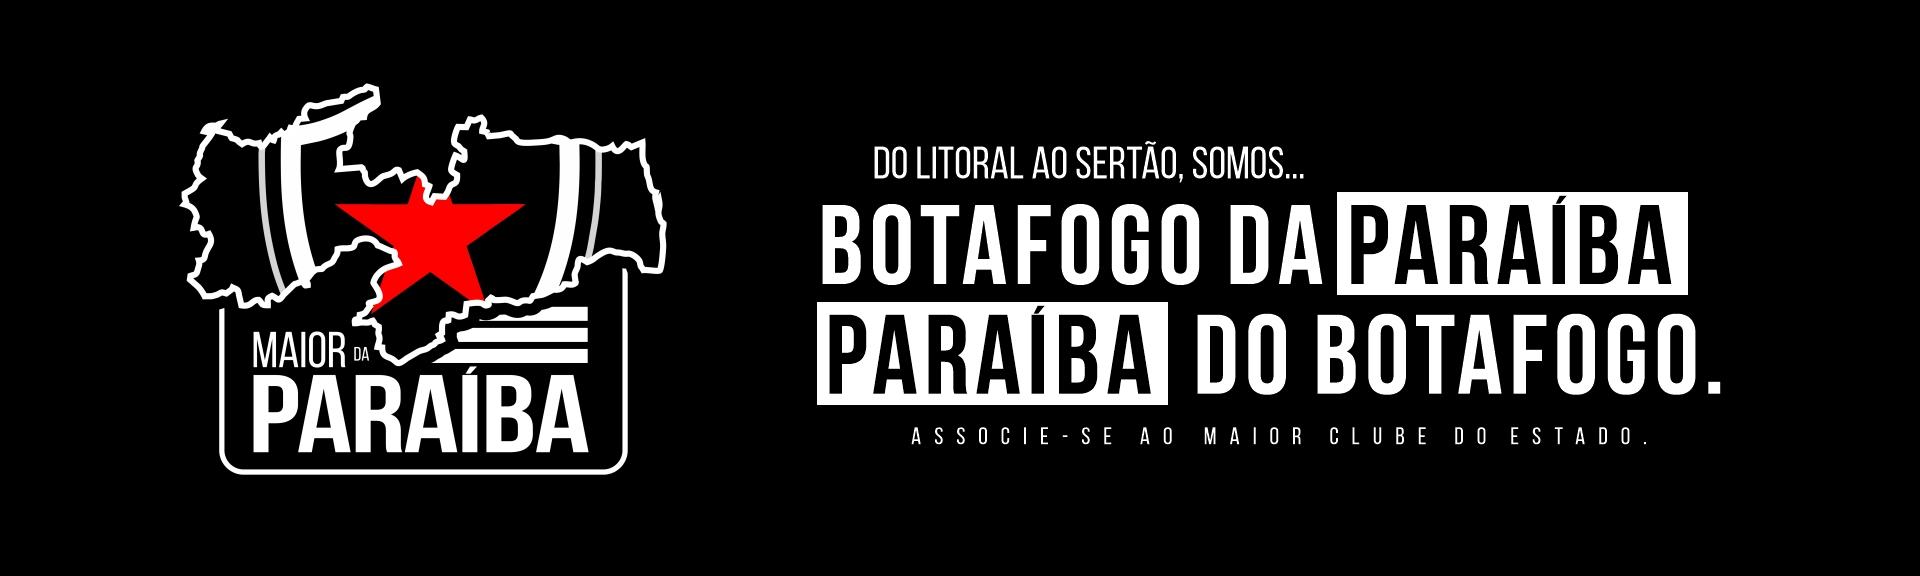 banner-maior-paraiba